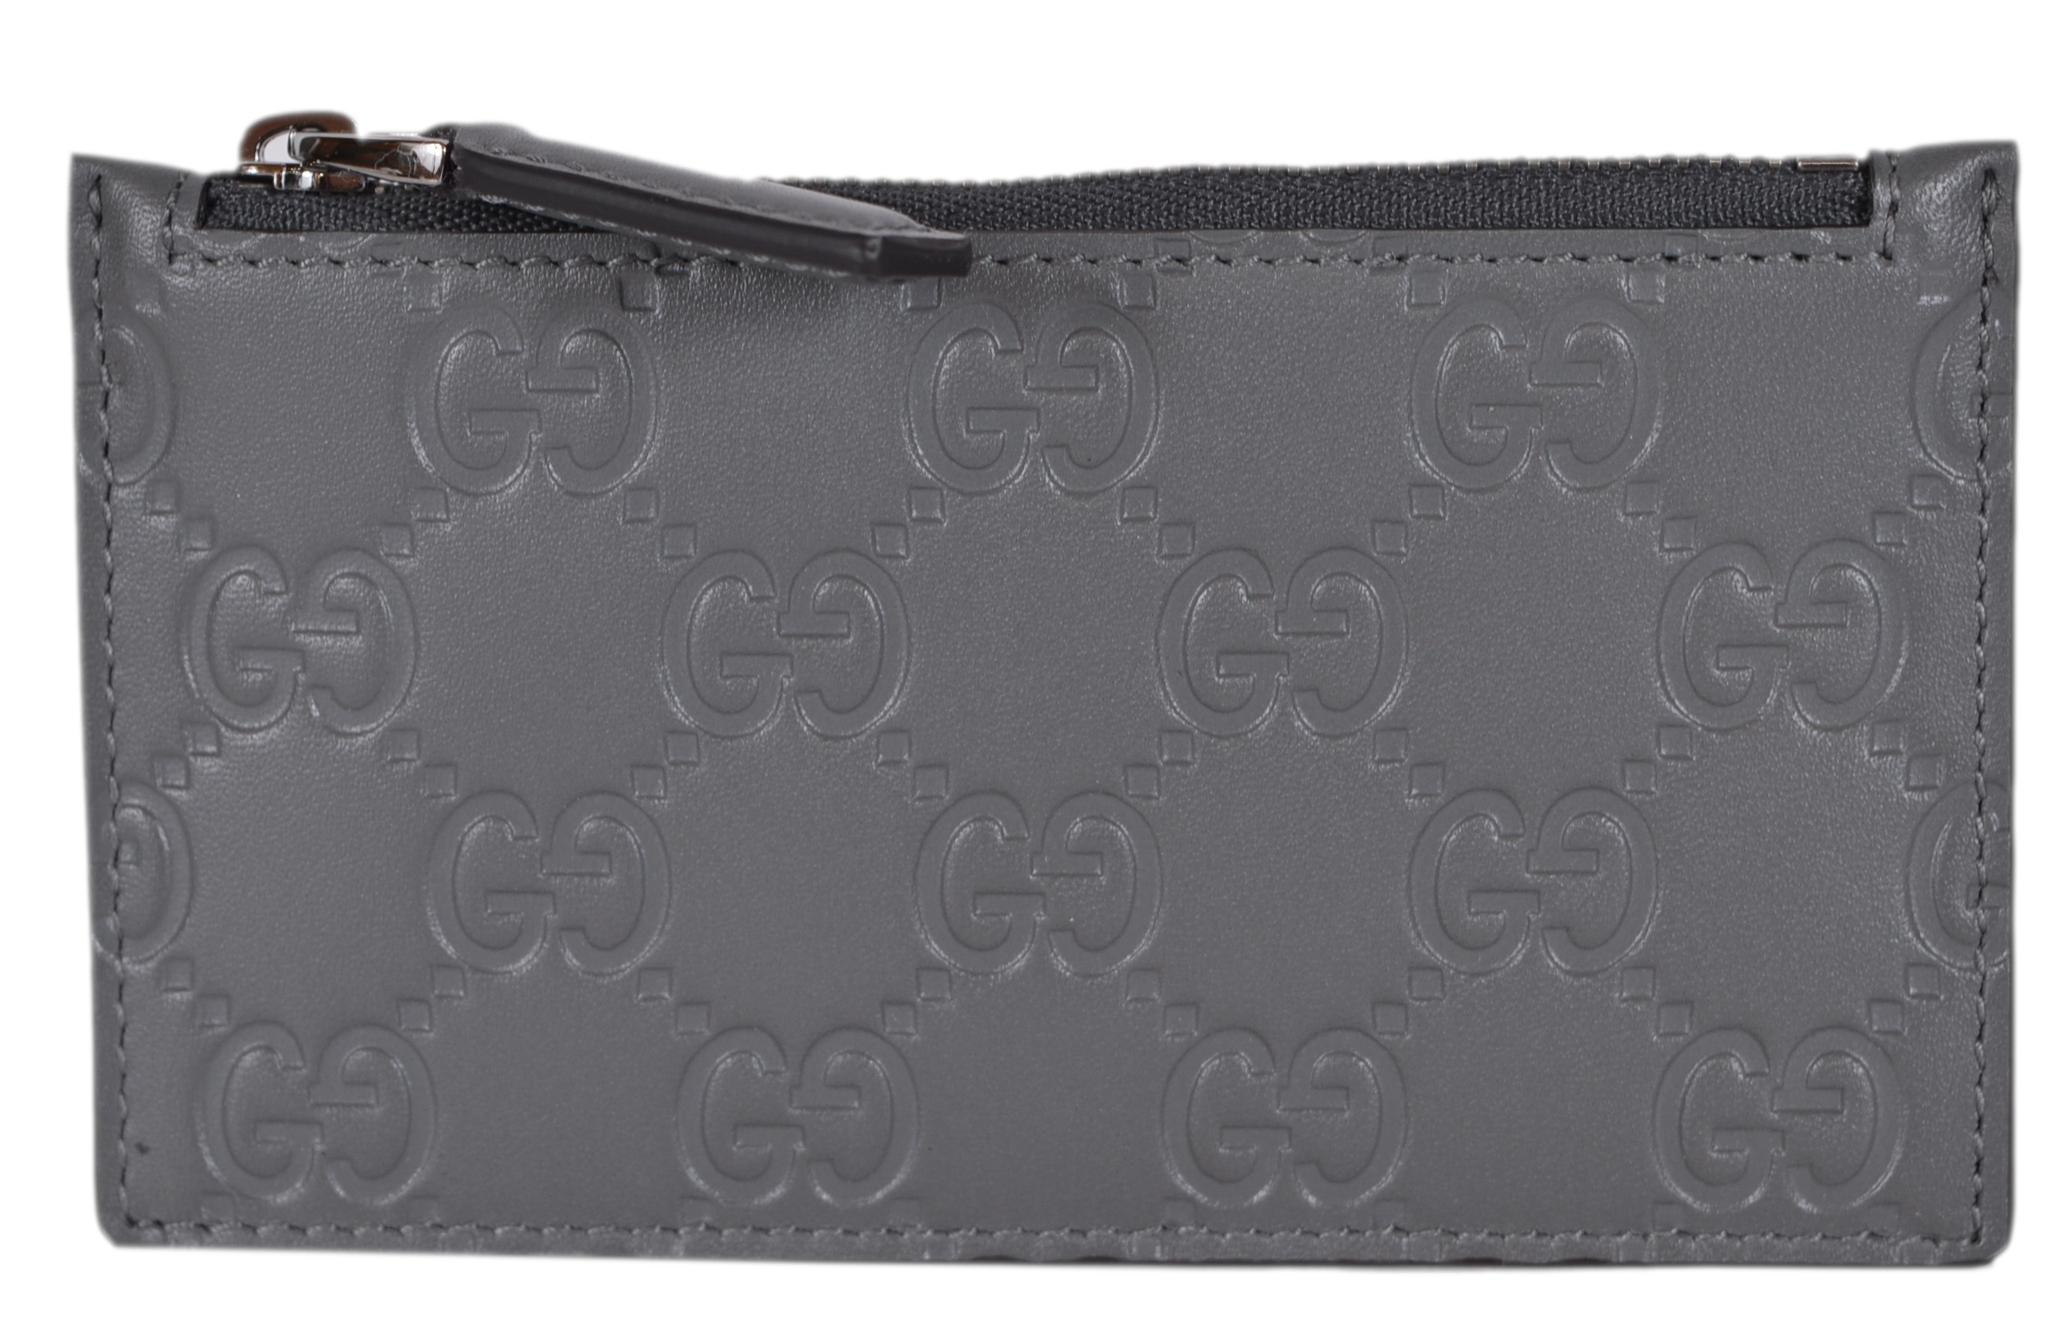 Gucci Zip Coin Pouch Card Case Guccissima Grey